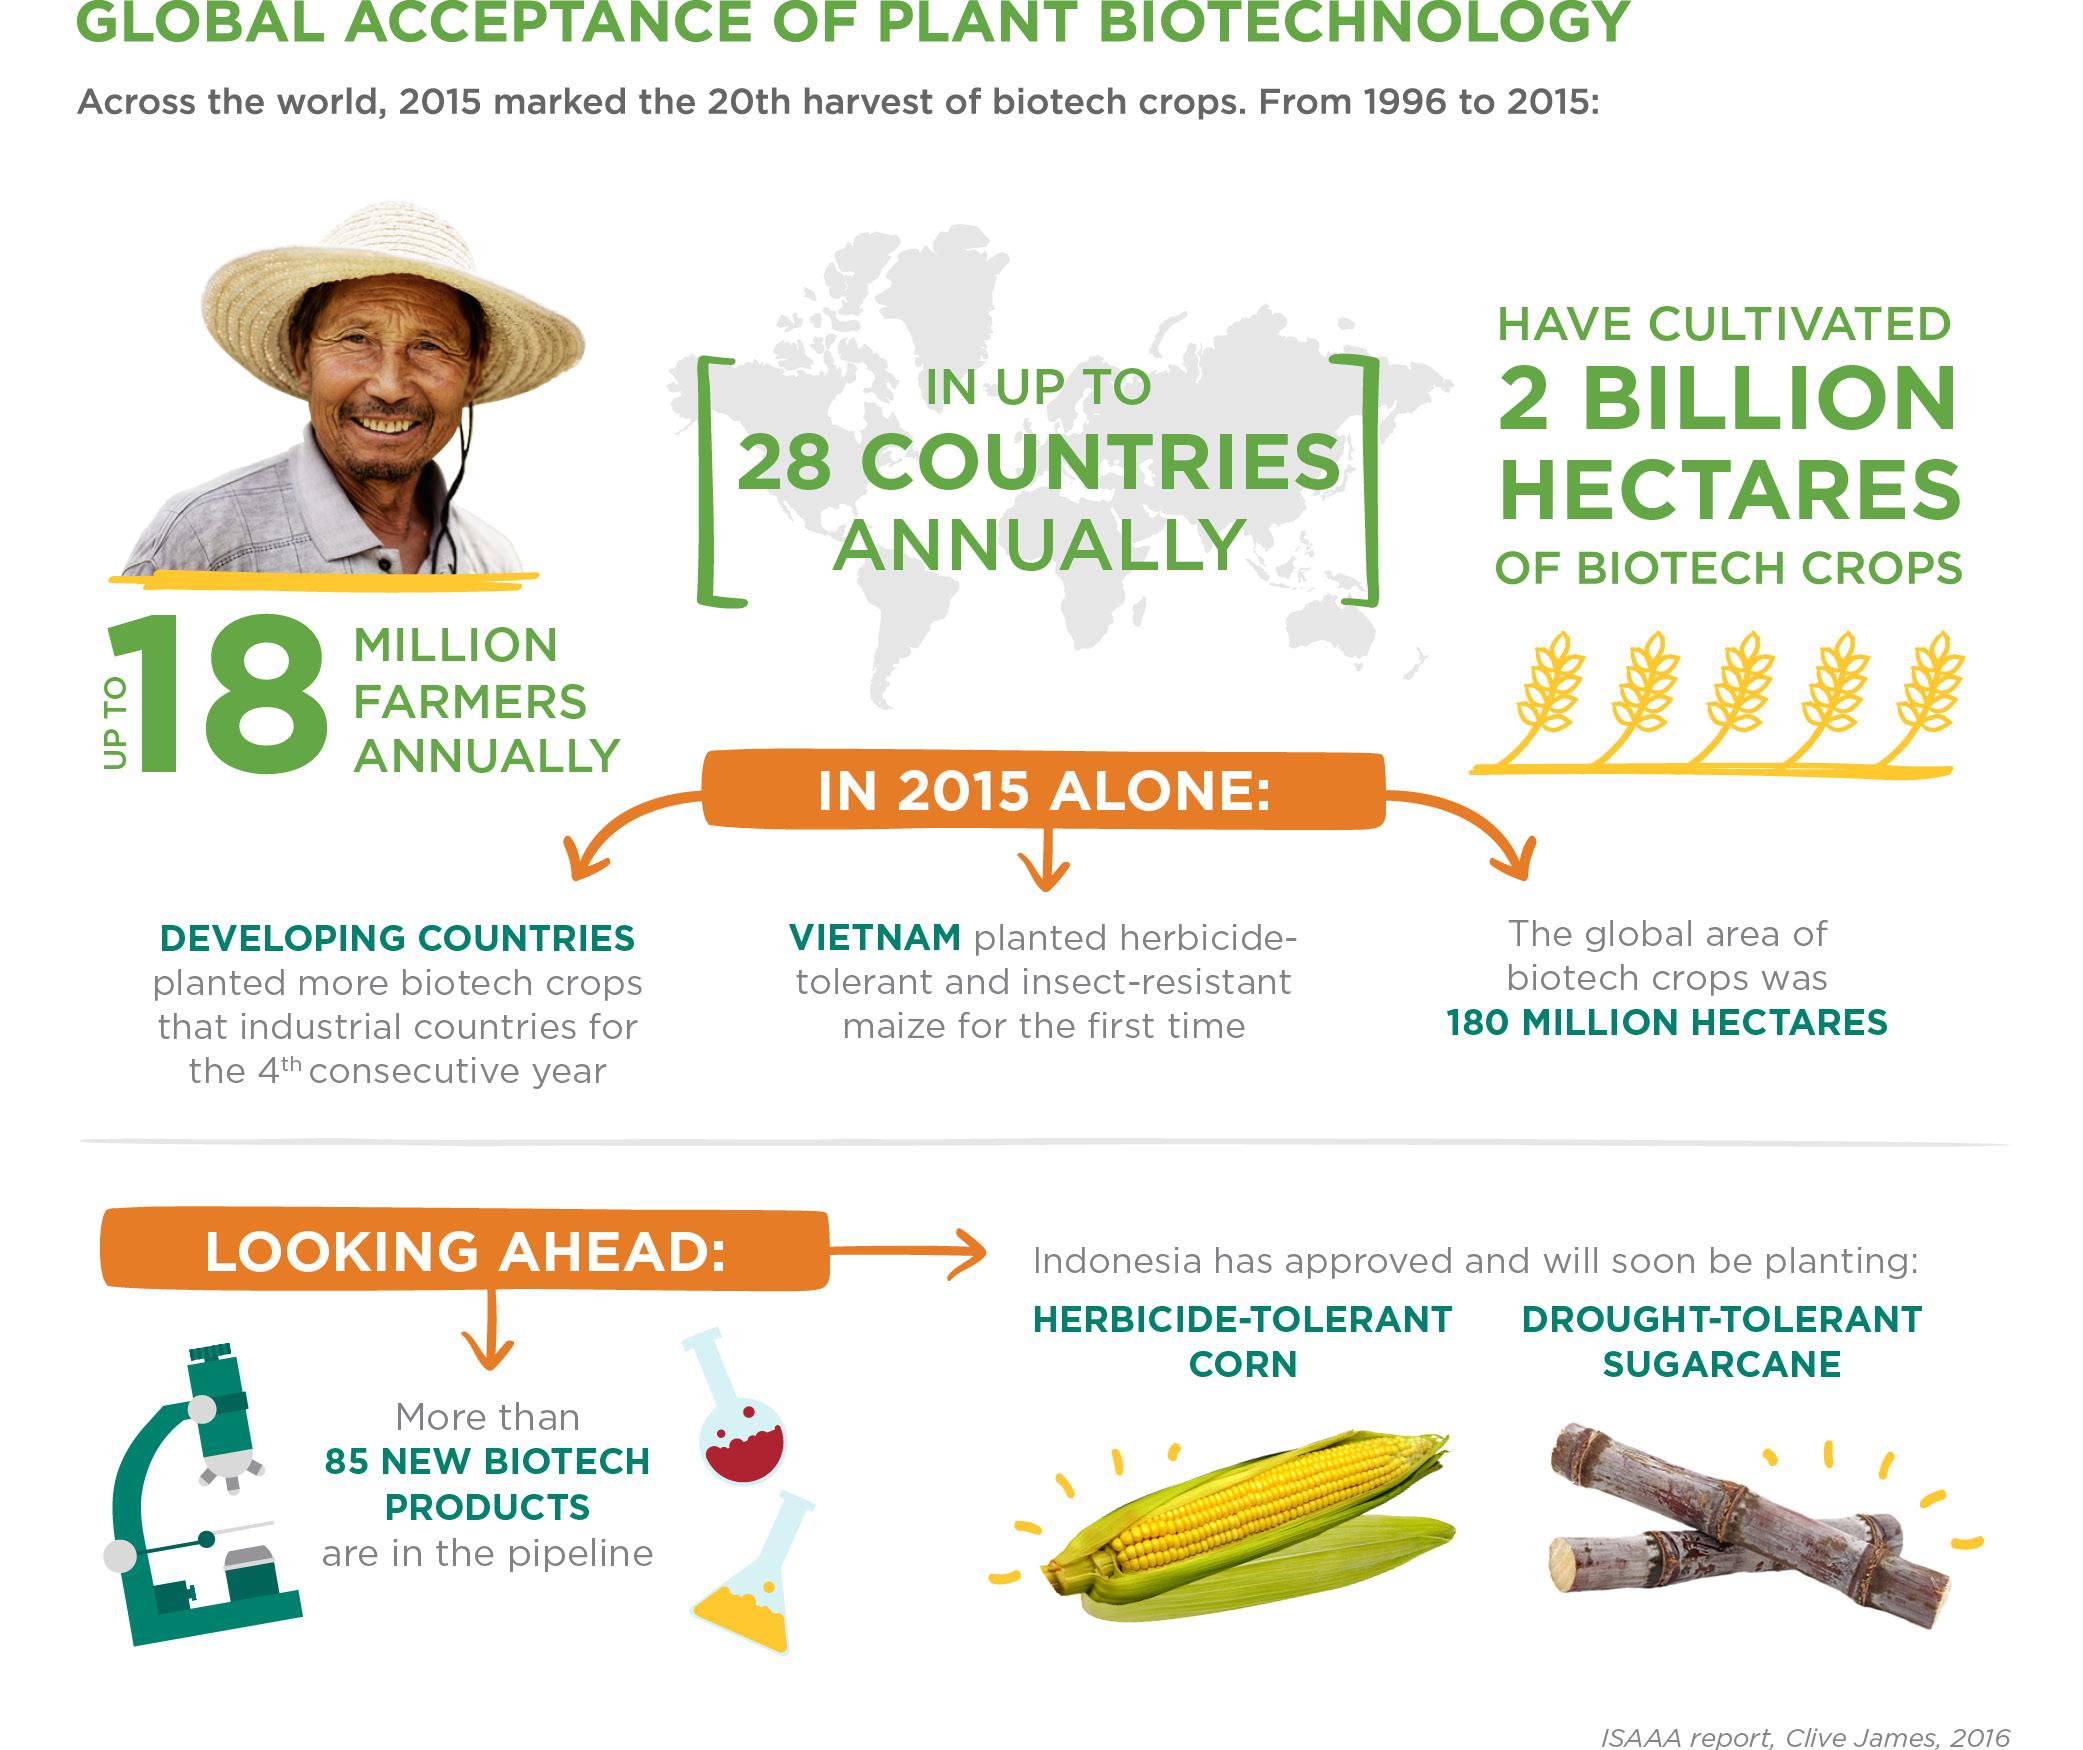 biotech_acceptance_infographic_V03.jpg